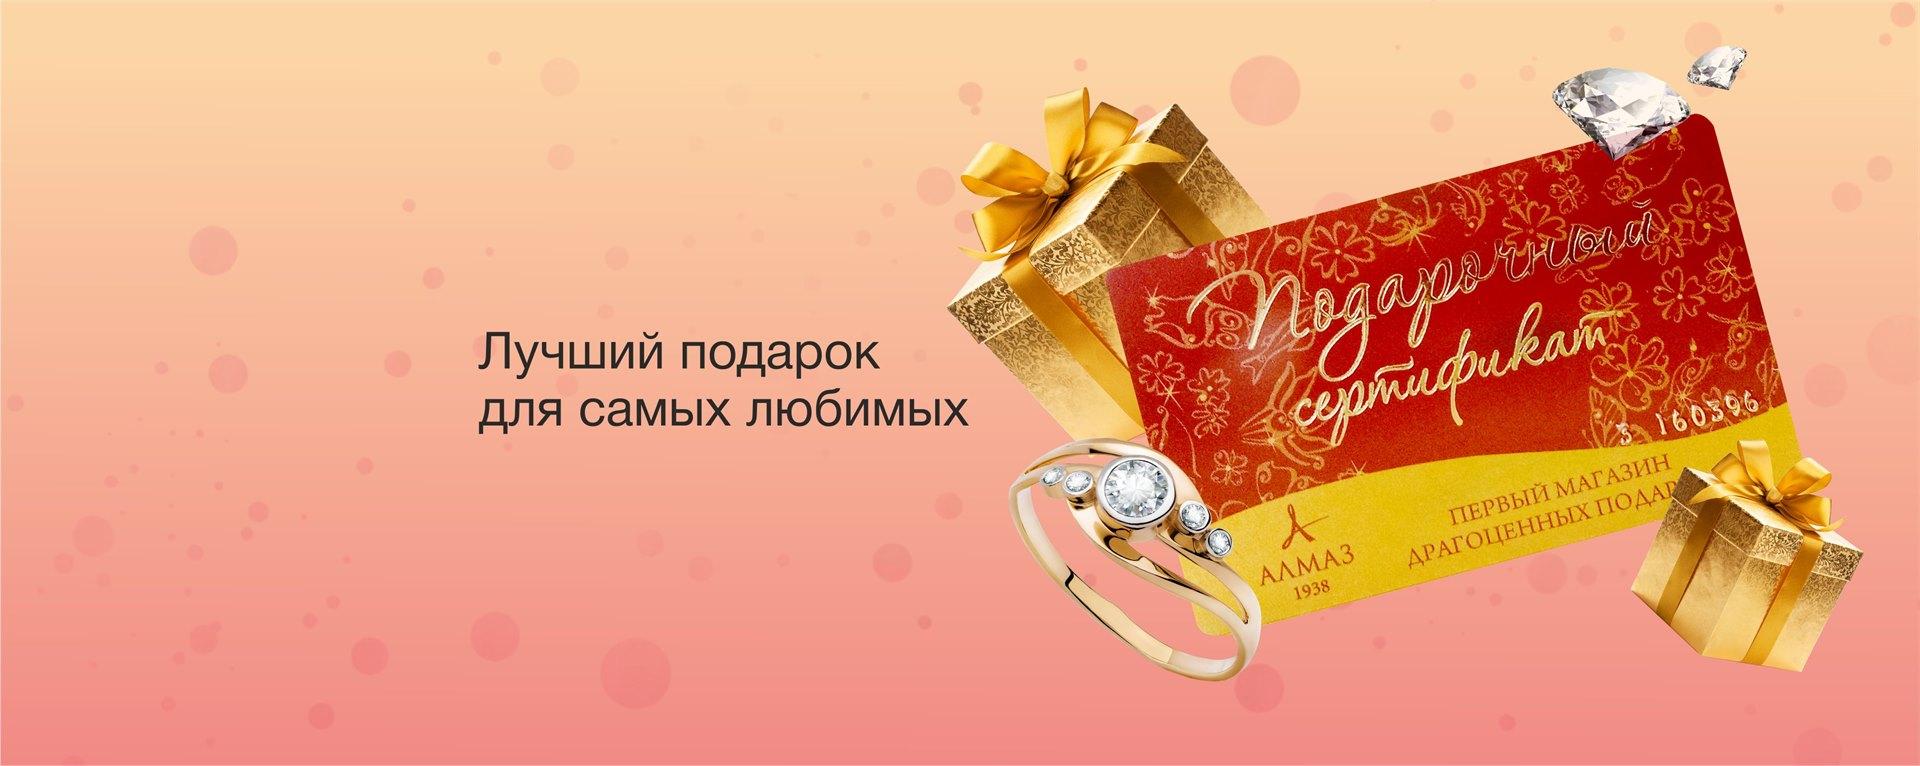 https://www.almazcom.ru/pub/img/Info/24/banner_sertifikaty.jpg